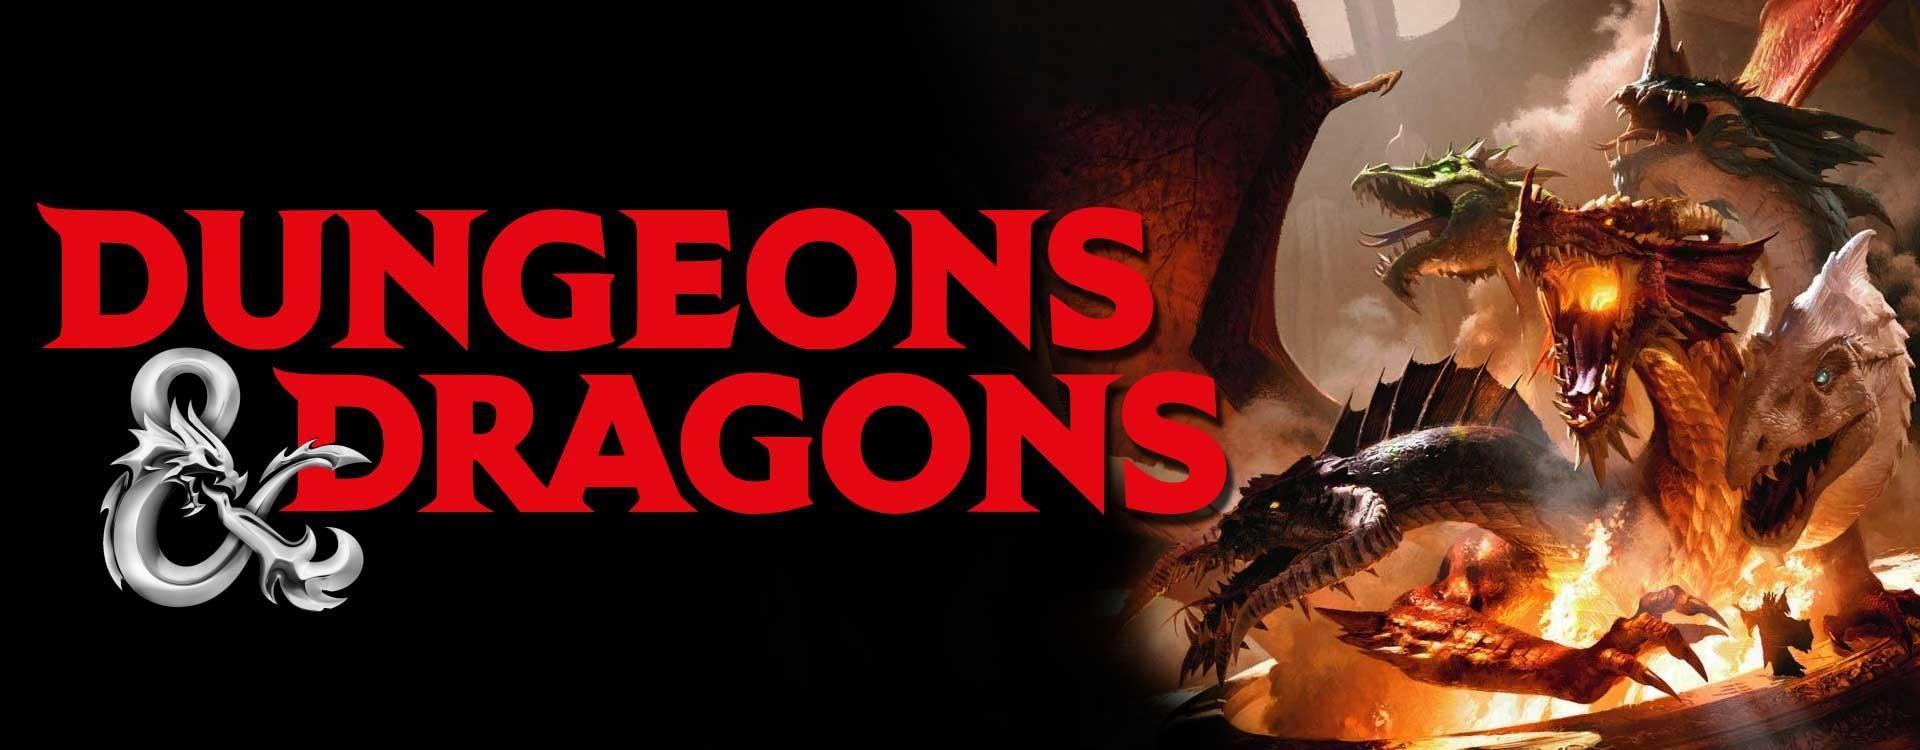 Dungeons & Dragons - Telford, Shropshire, West Midlands